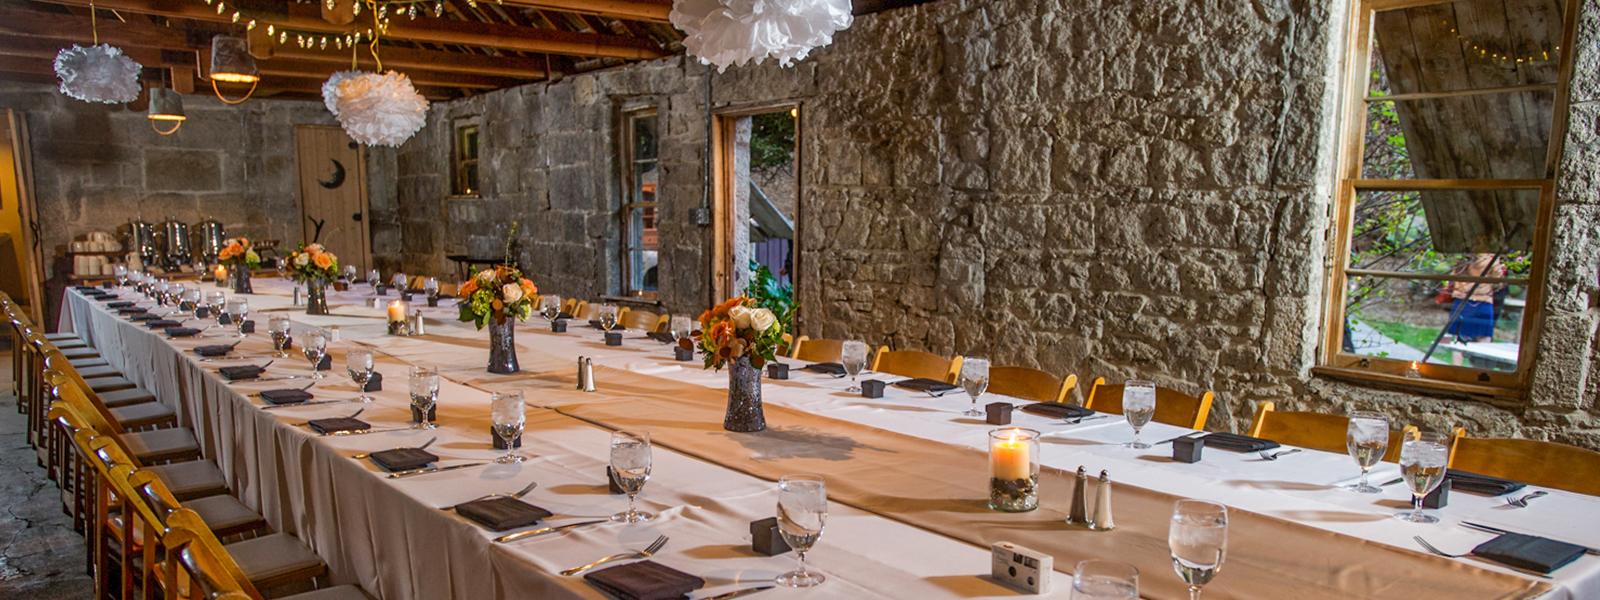 Temecula wedding venues wineries hotels temecula cvb junglespirit Images